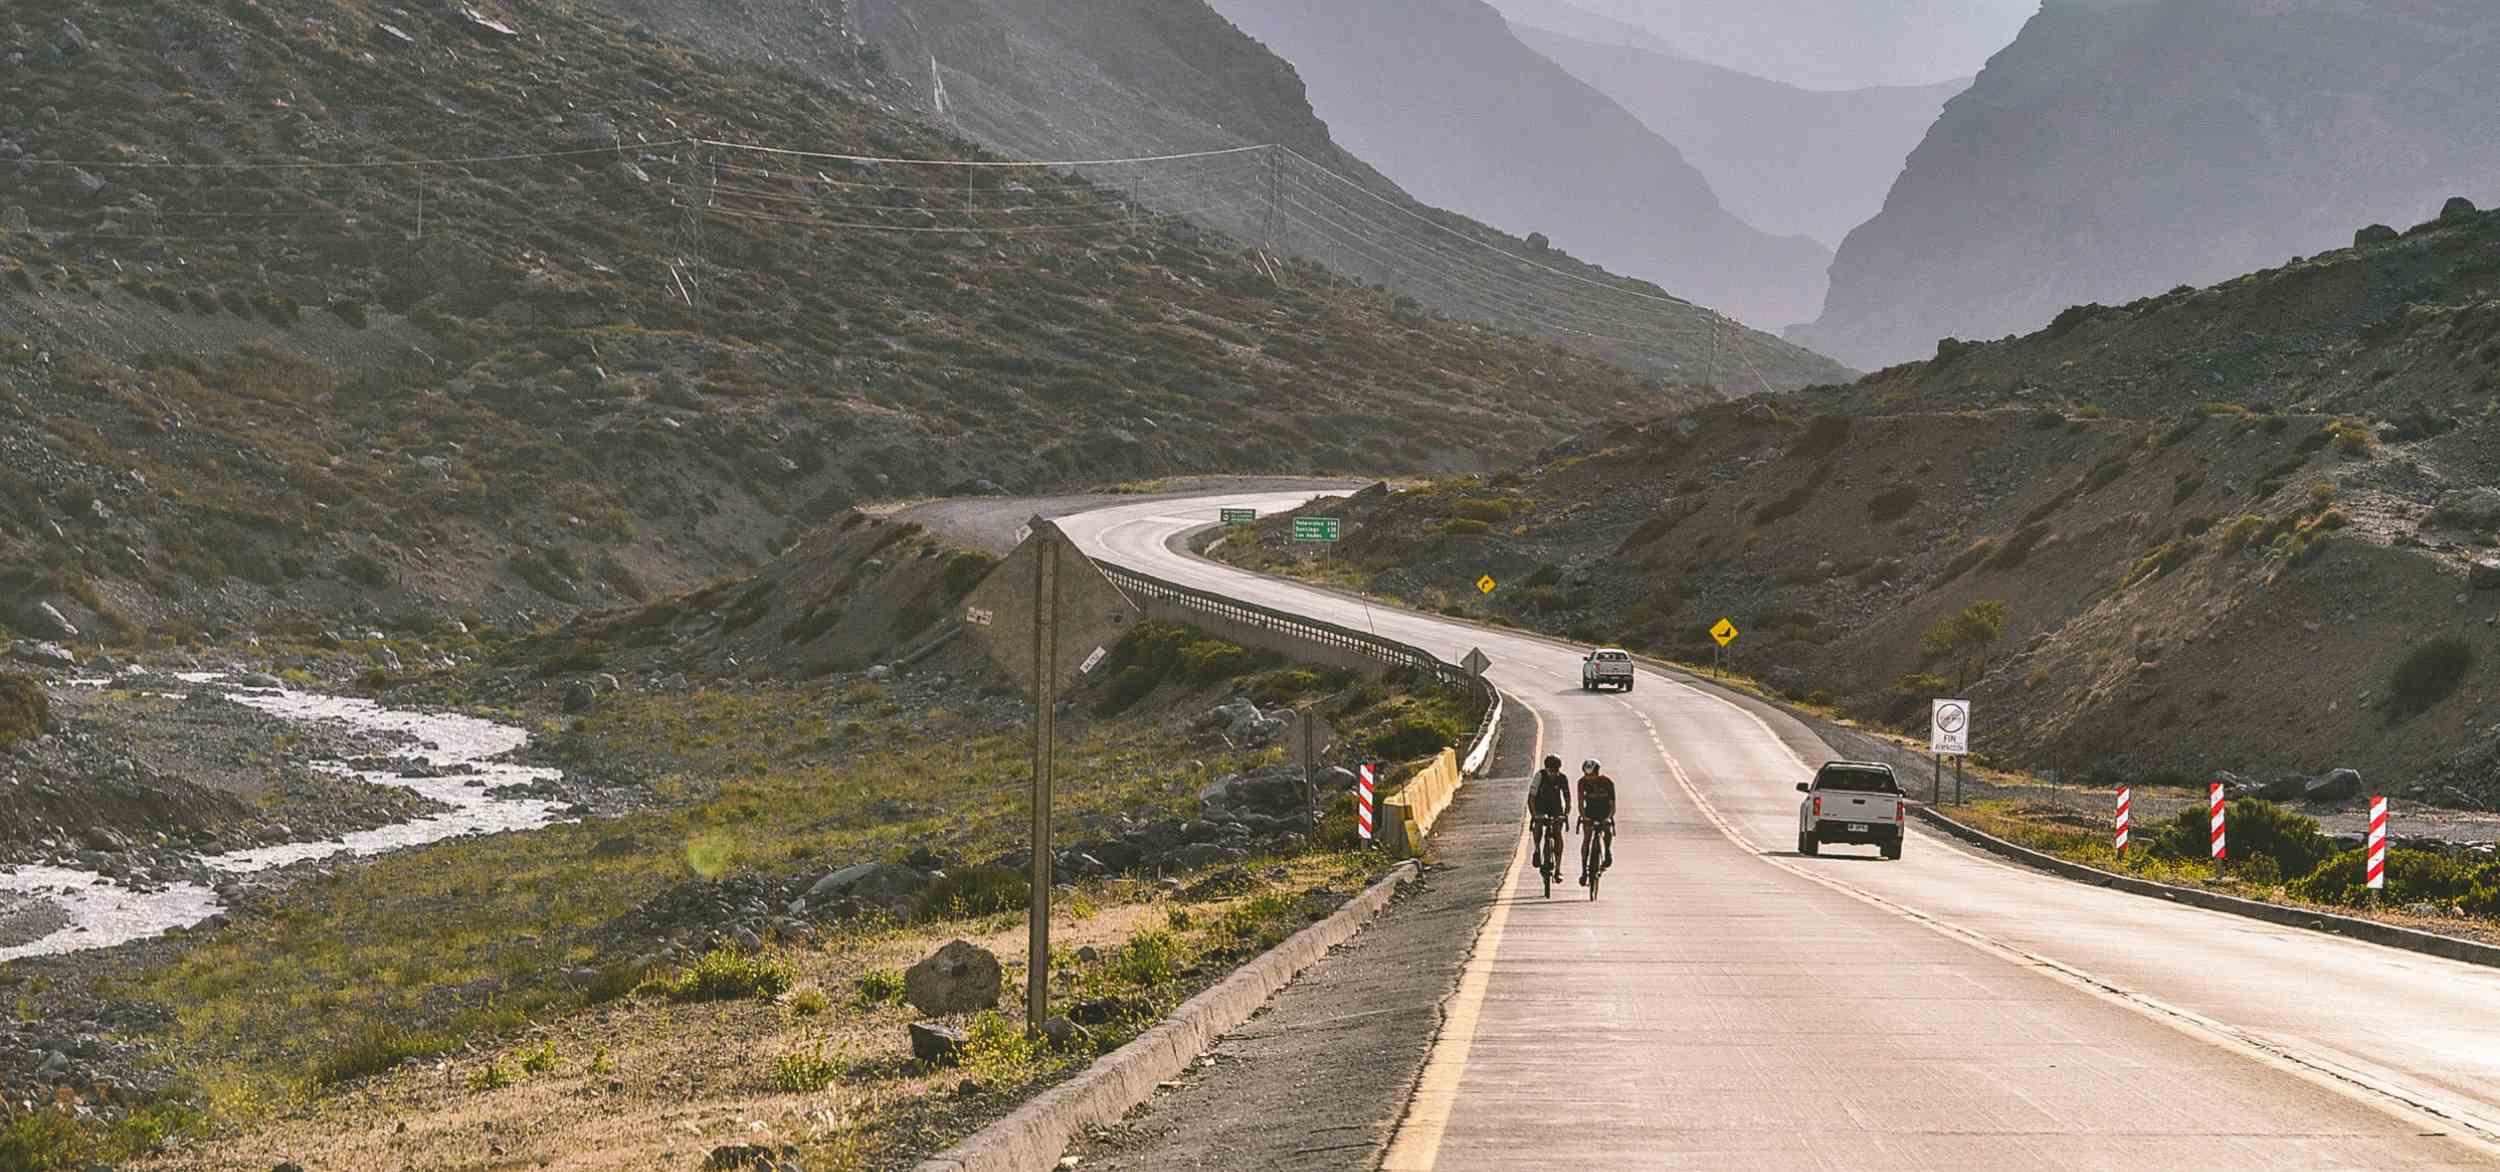 Two people riding down the mountain on their bikes